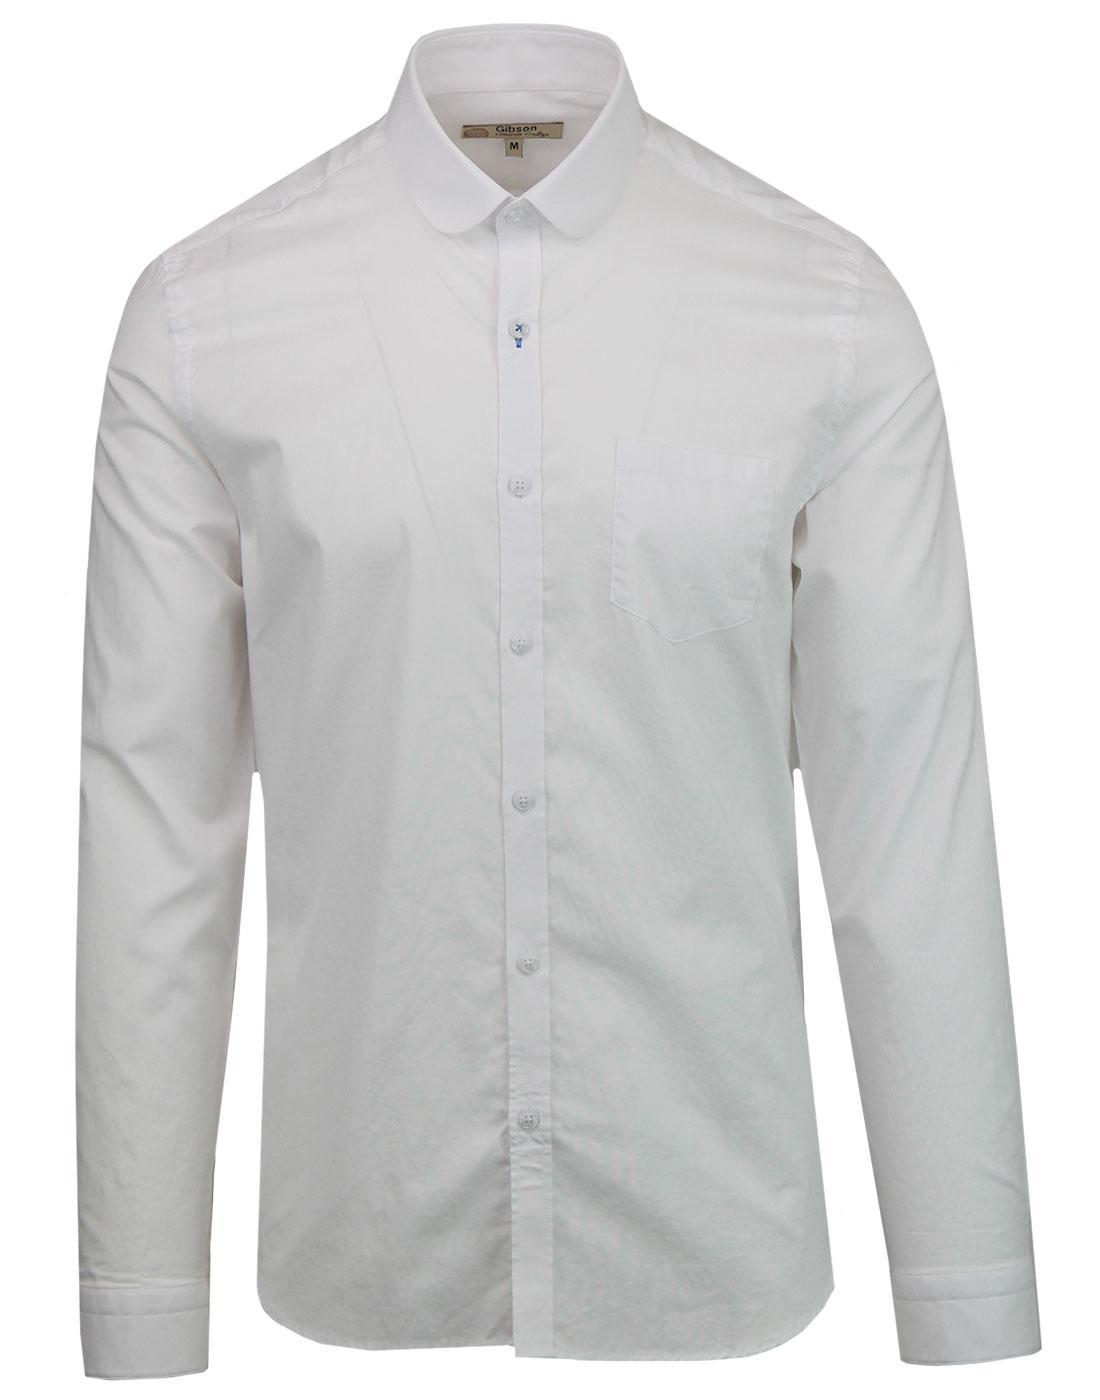 GIBSON LONDON 60s Mod Penny Round Collar Shirt (W)